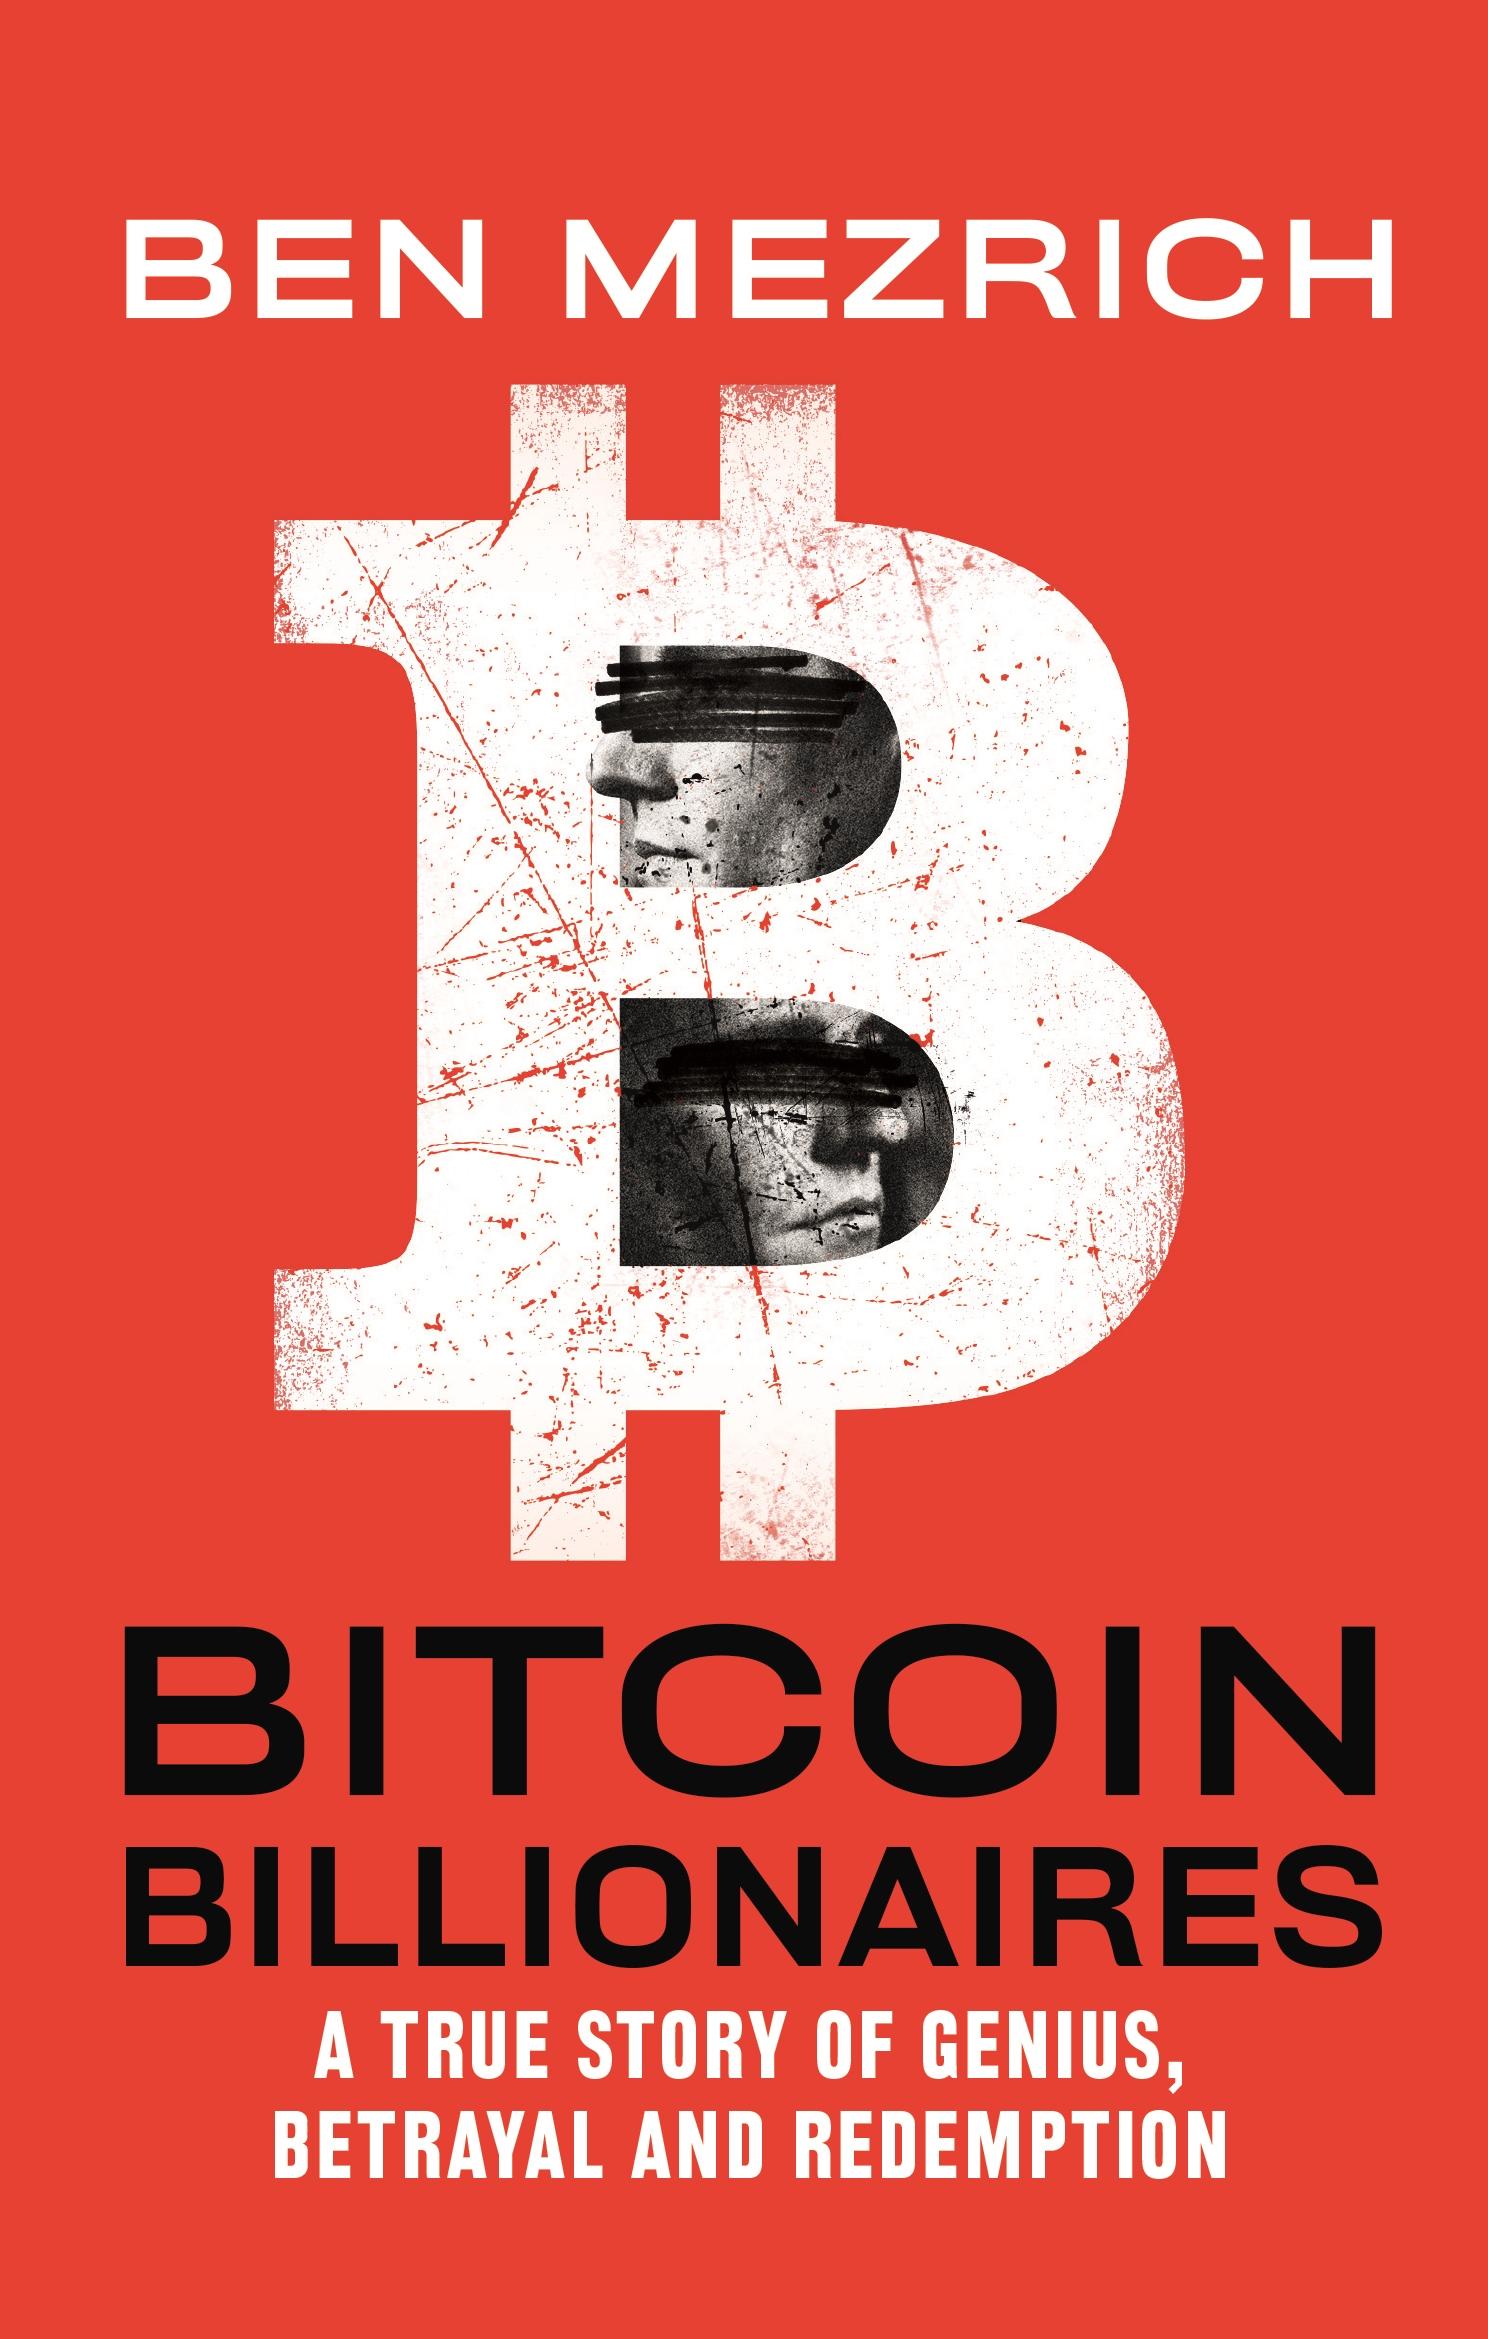 Download Ebook Bitcoin Billionaires by Ben Mezrich Pdf